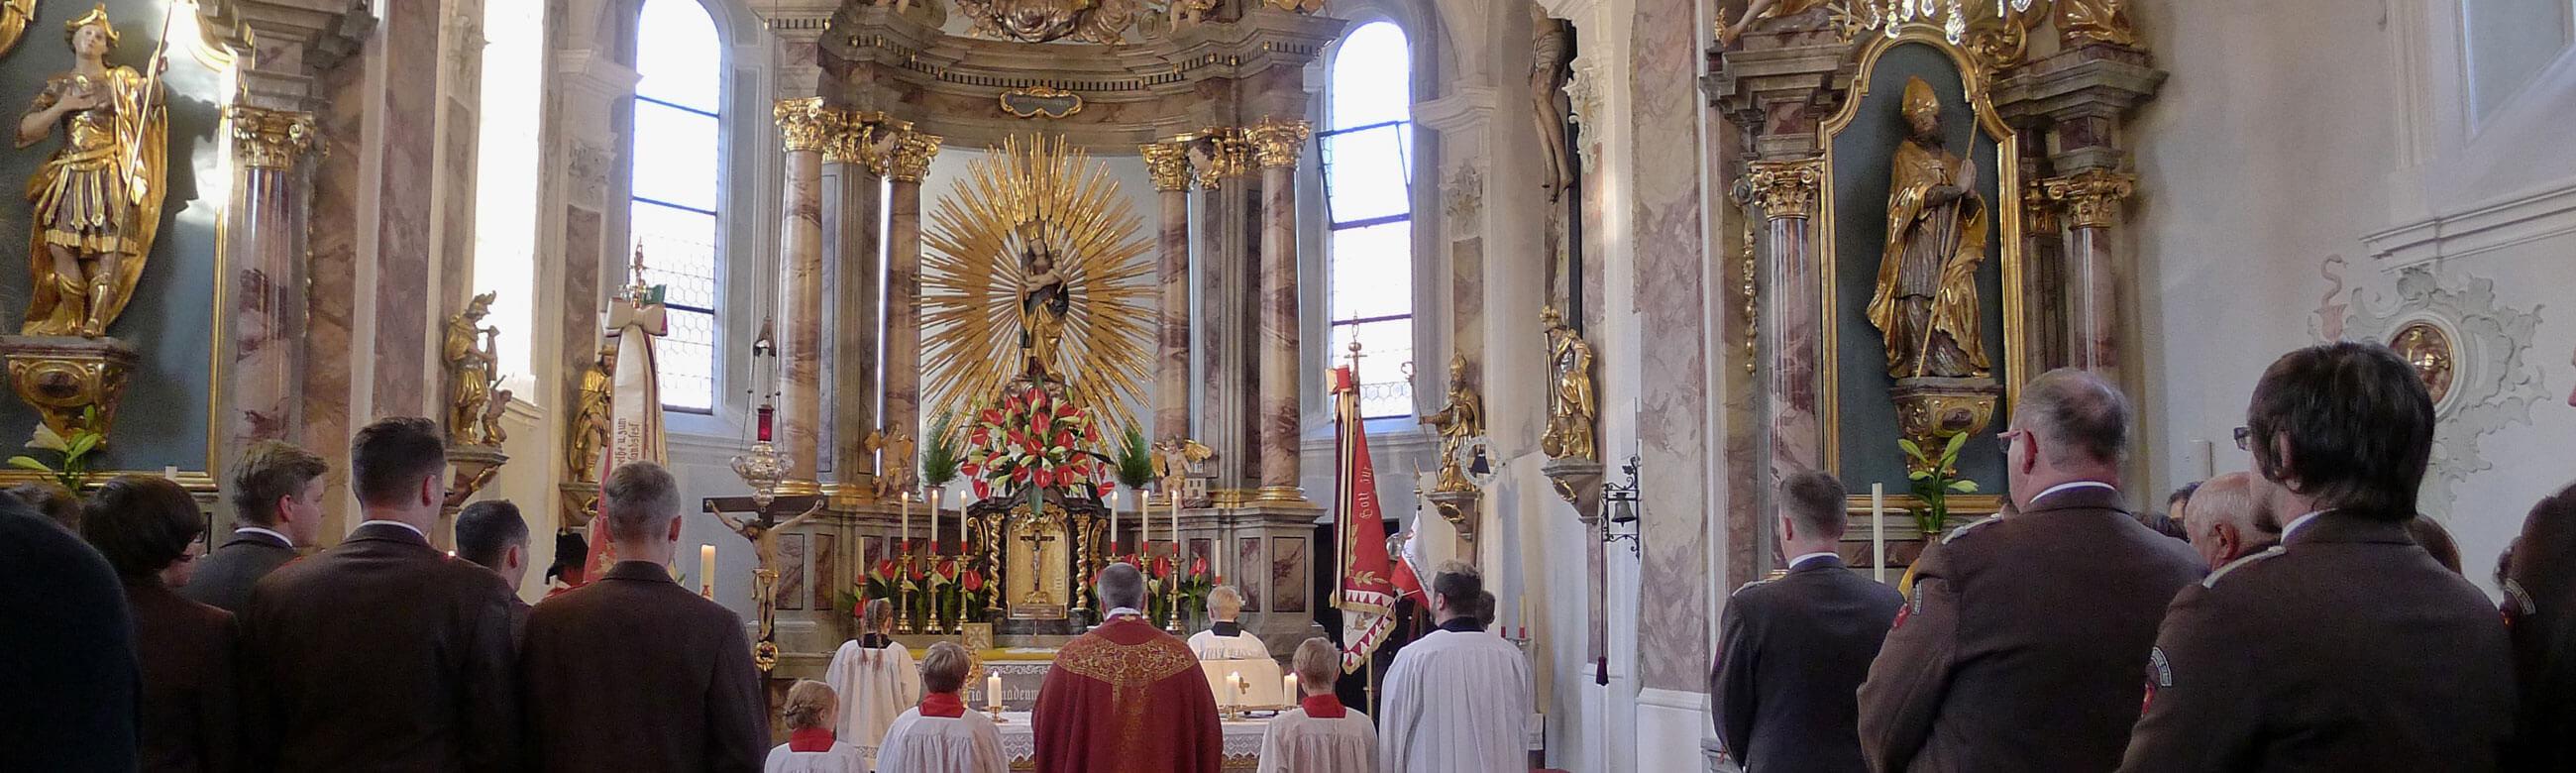 Pfarrkirche Amras Johannesgemeinschaft Messe SMRO MHDA